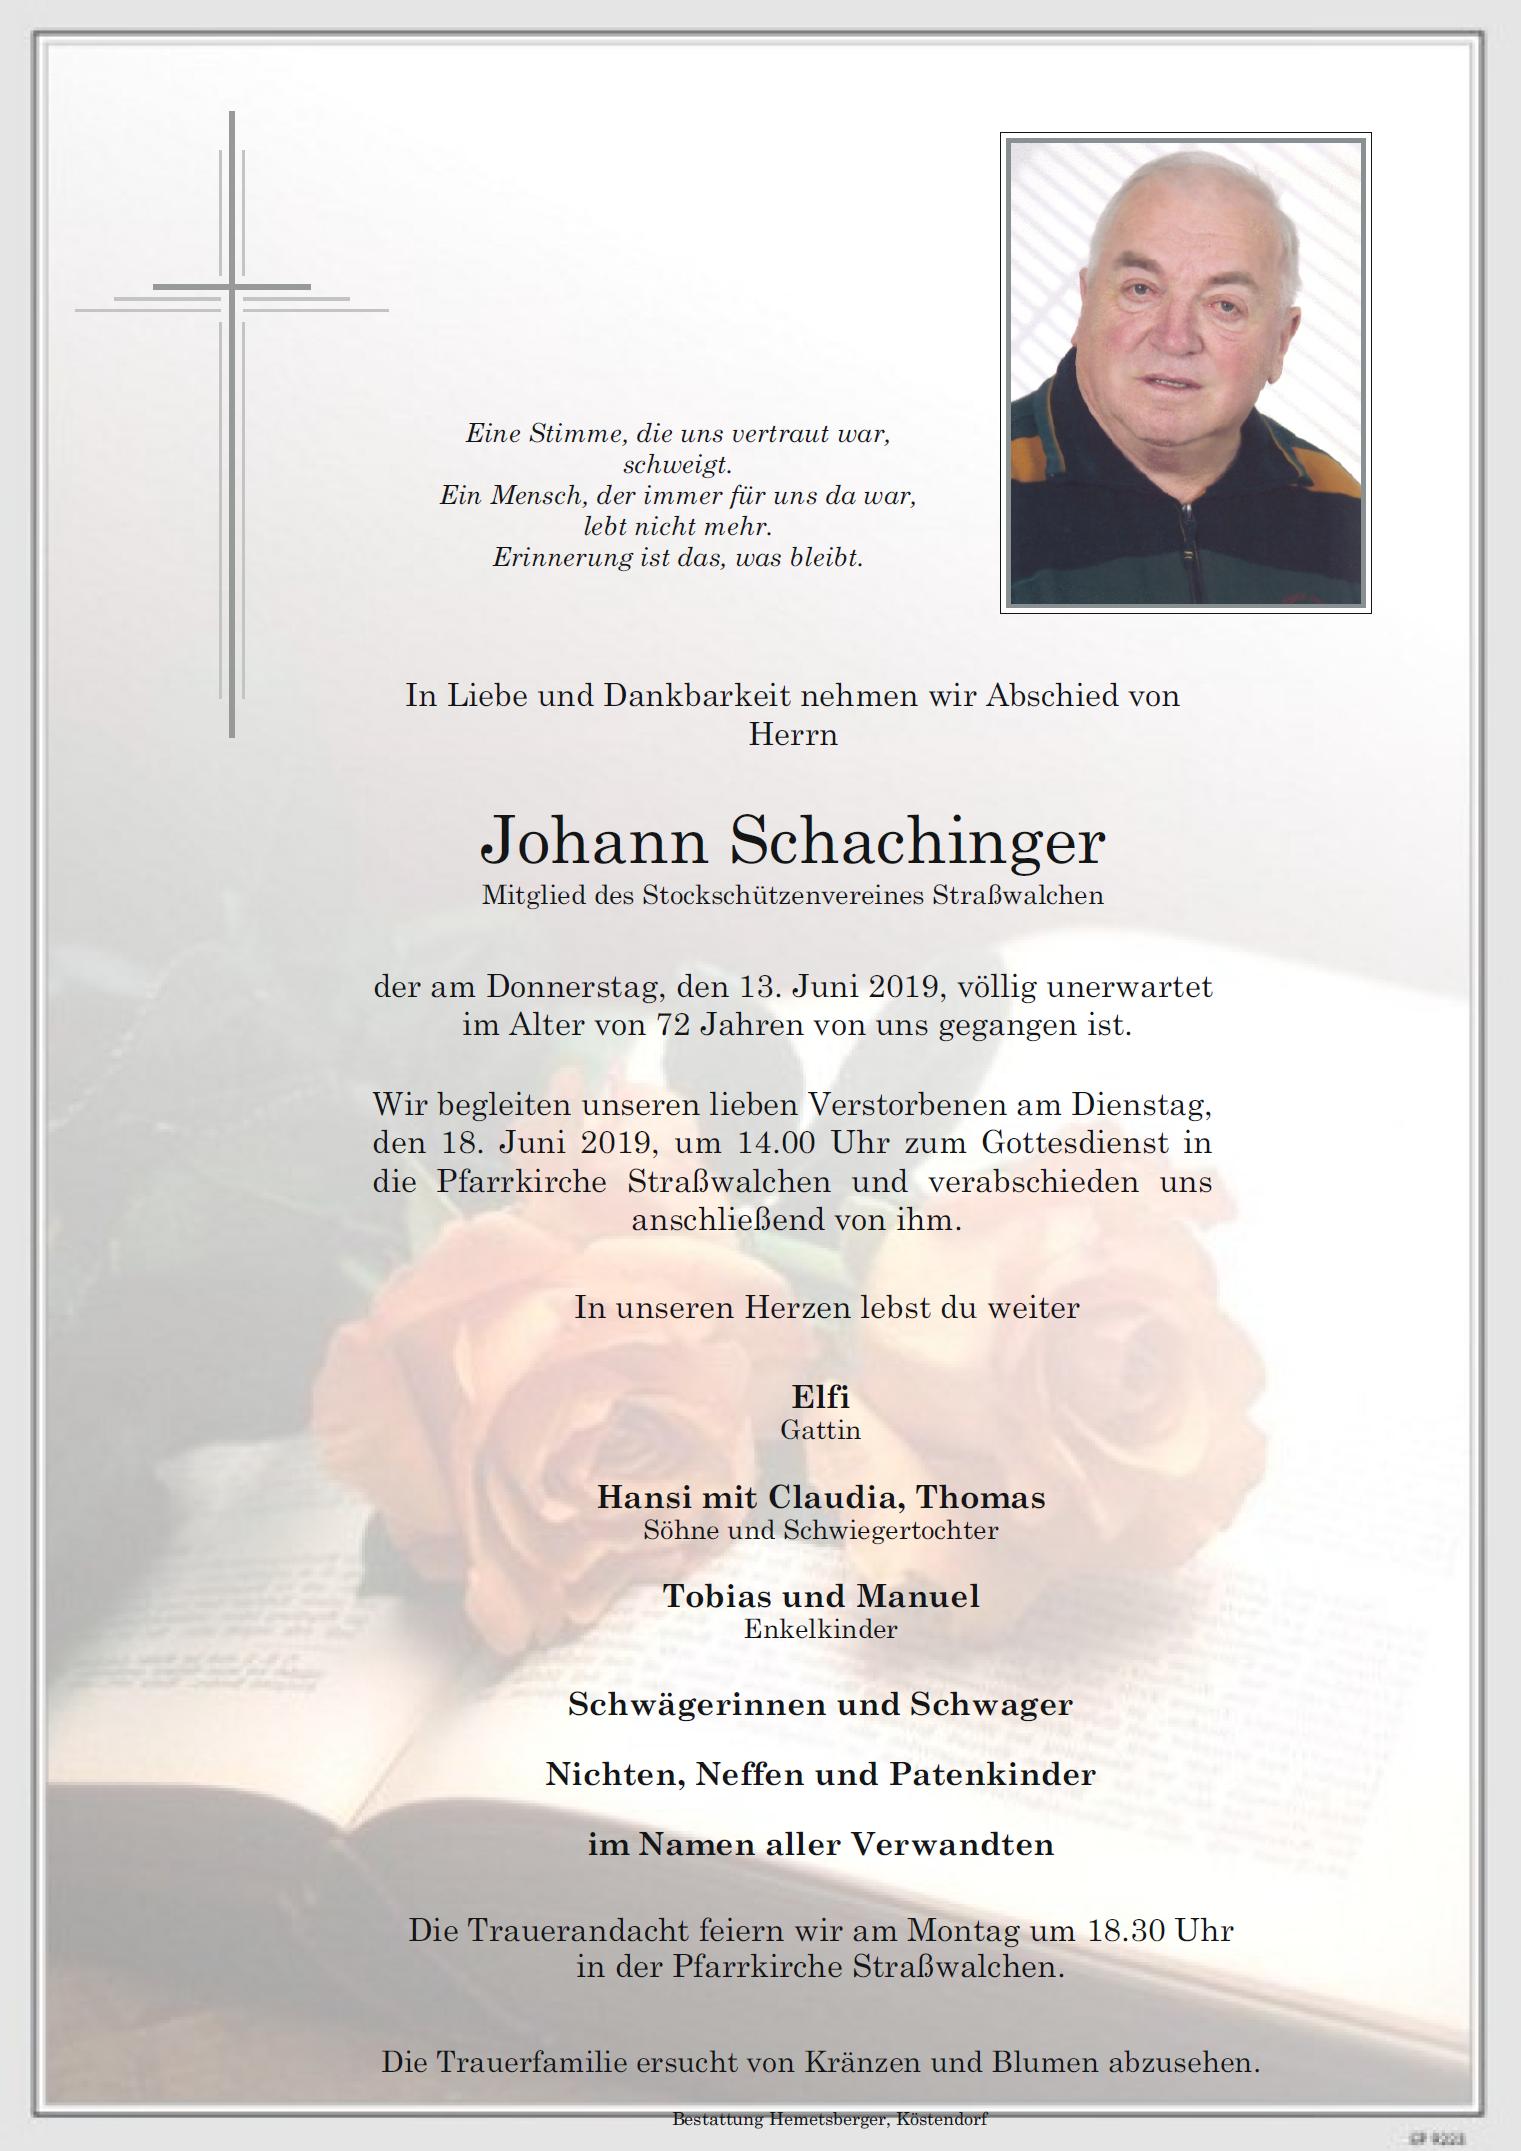 schachinger